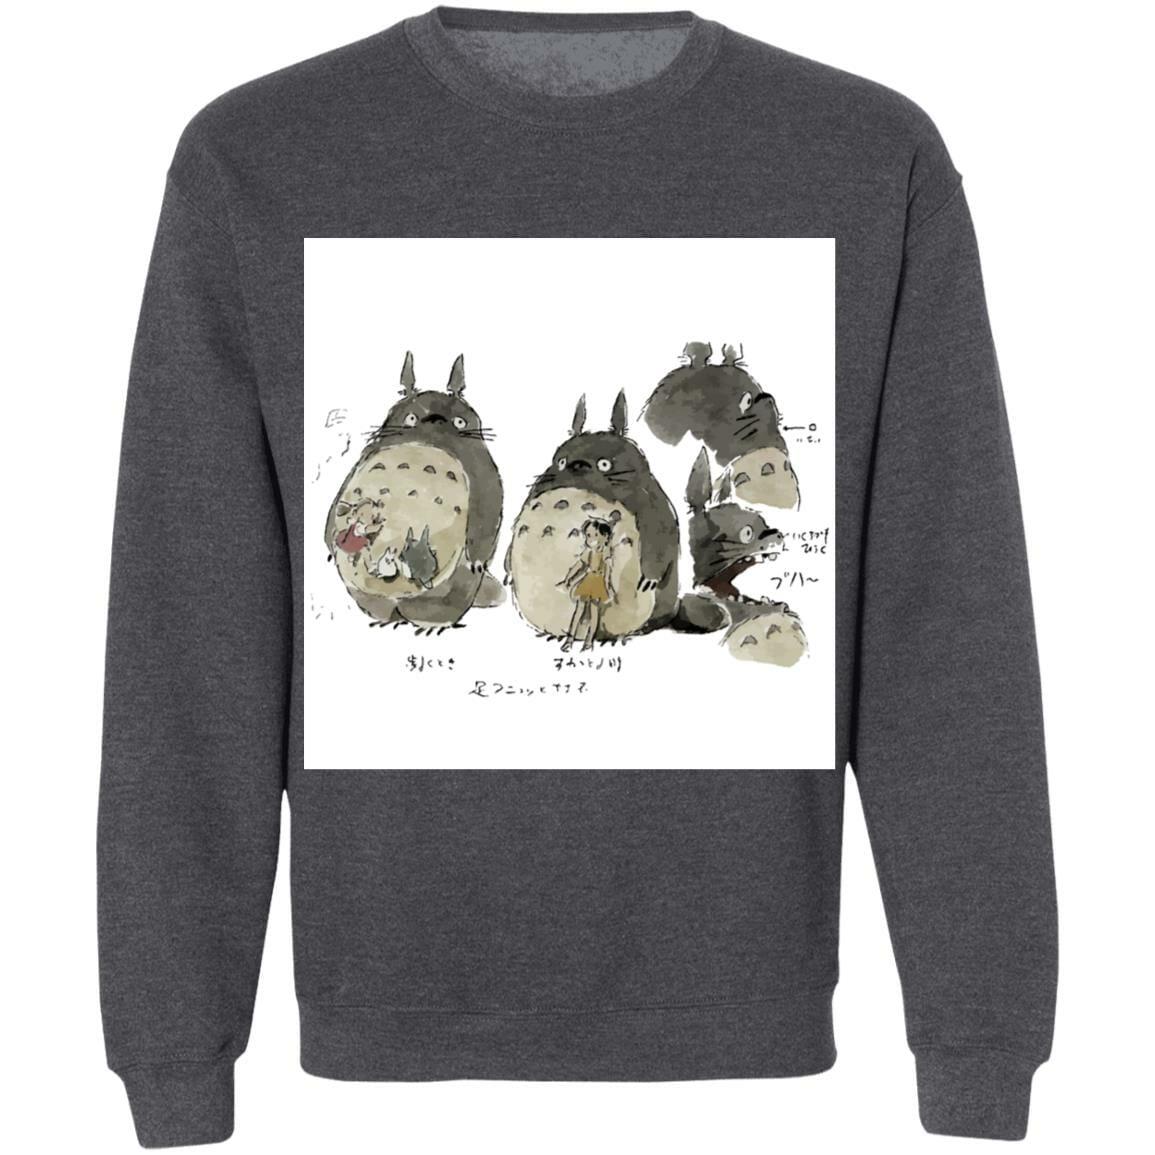 My Neighbor Totoro Sketch Sweatshirt Unisex